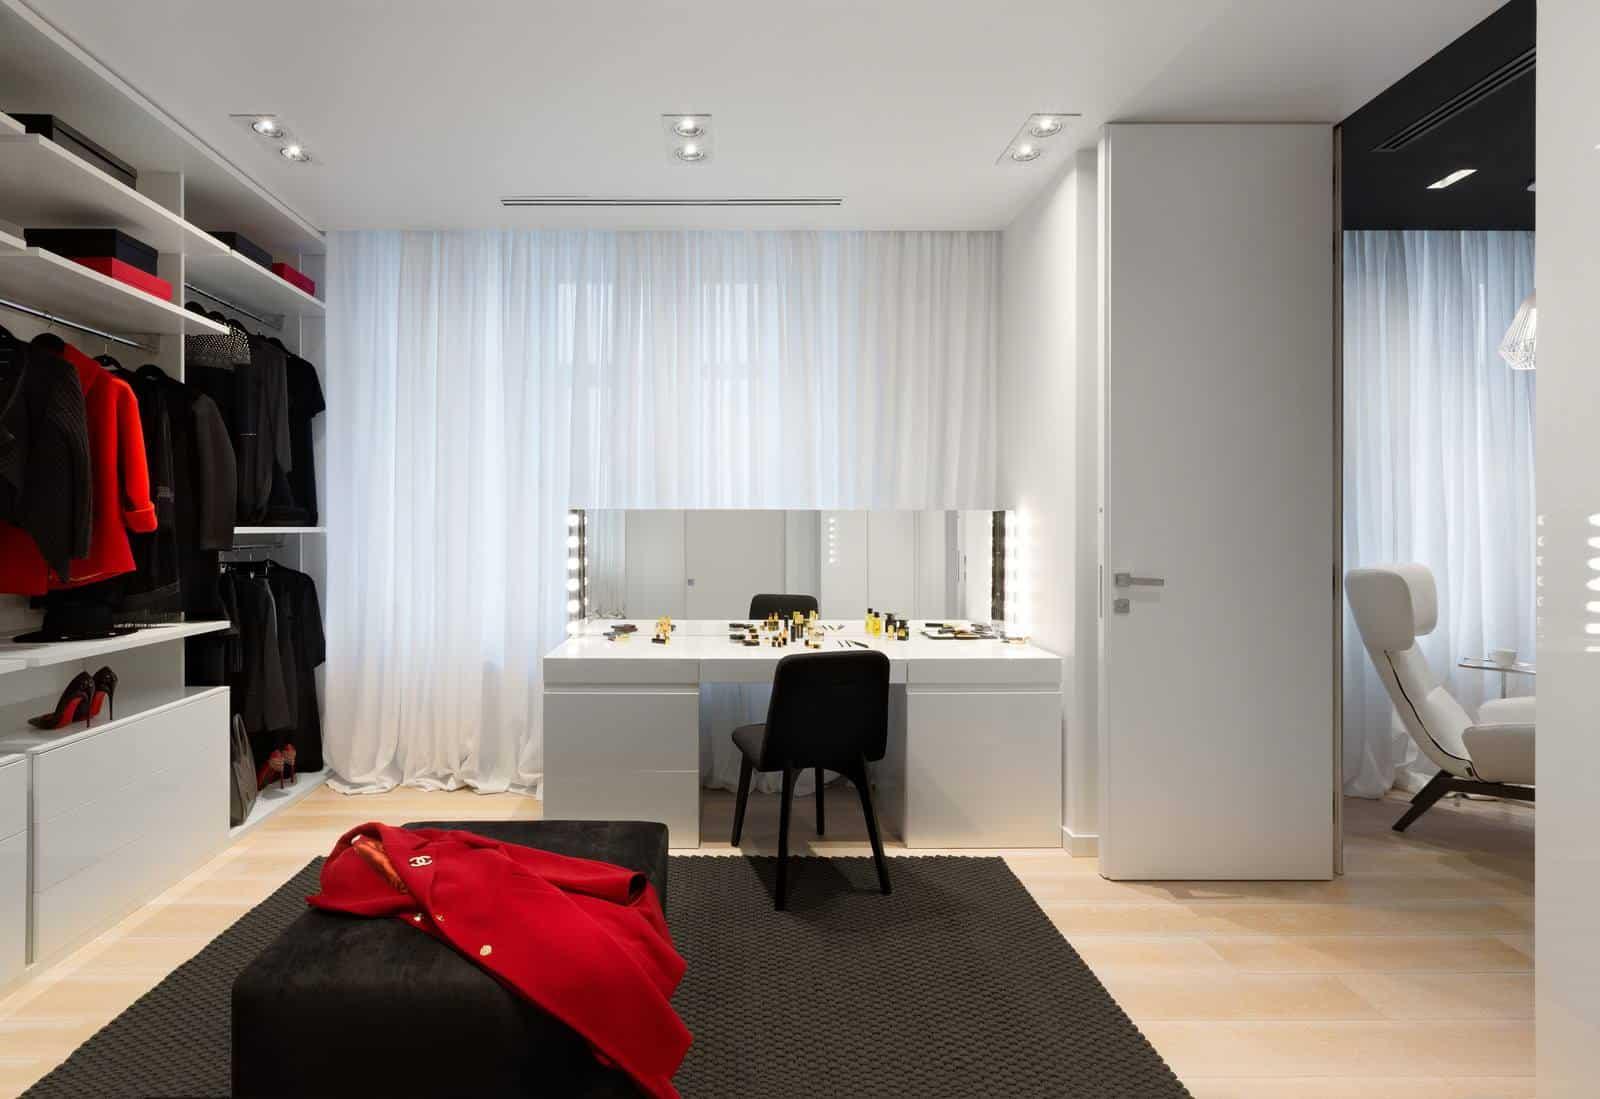 thiet-ke-noi-that-chung-cu-mai-dich-23 Thiết kế nội thất chung cư Mai Dịch - A. Sinh